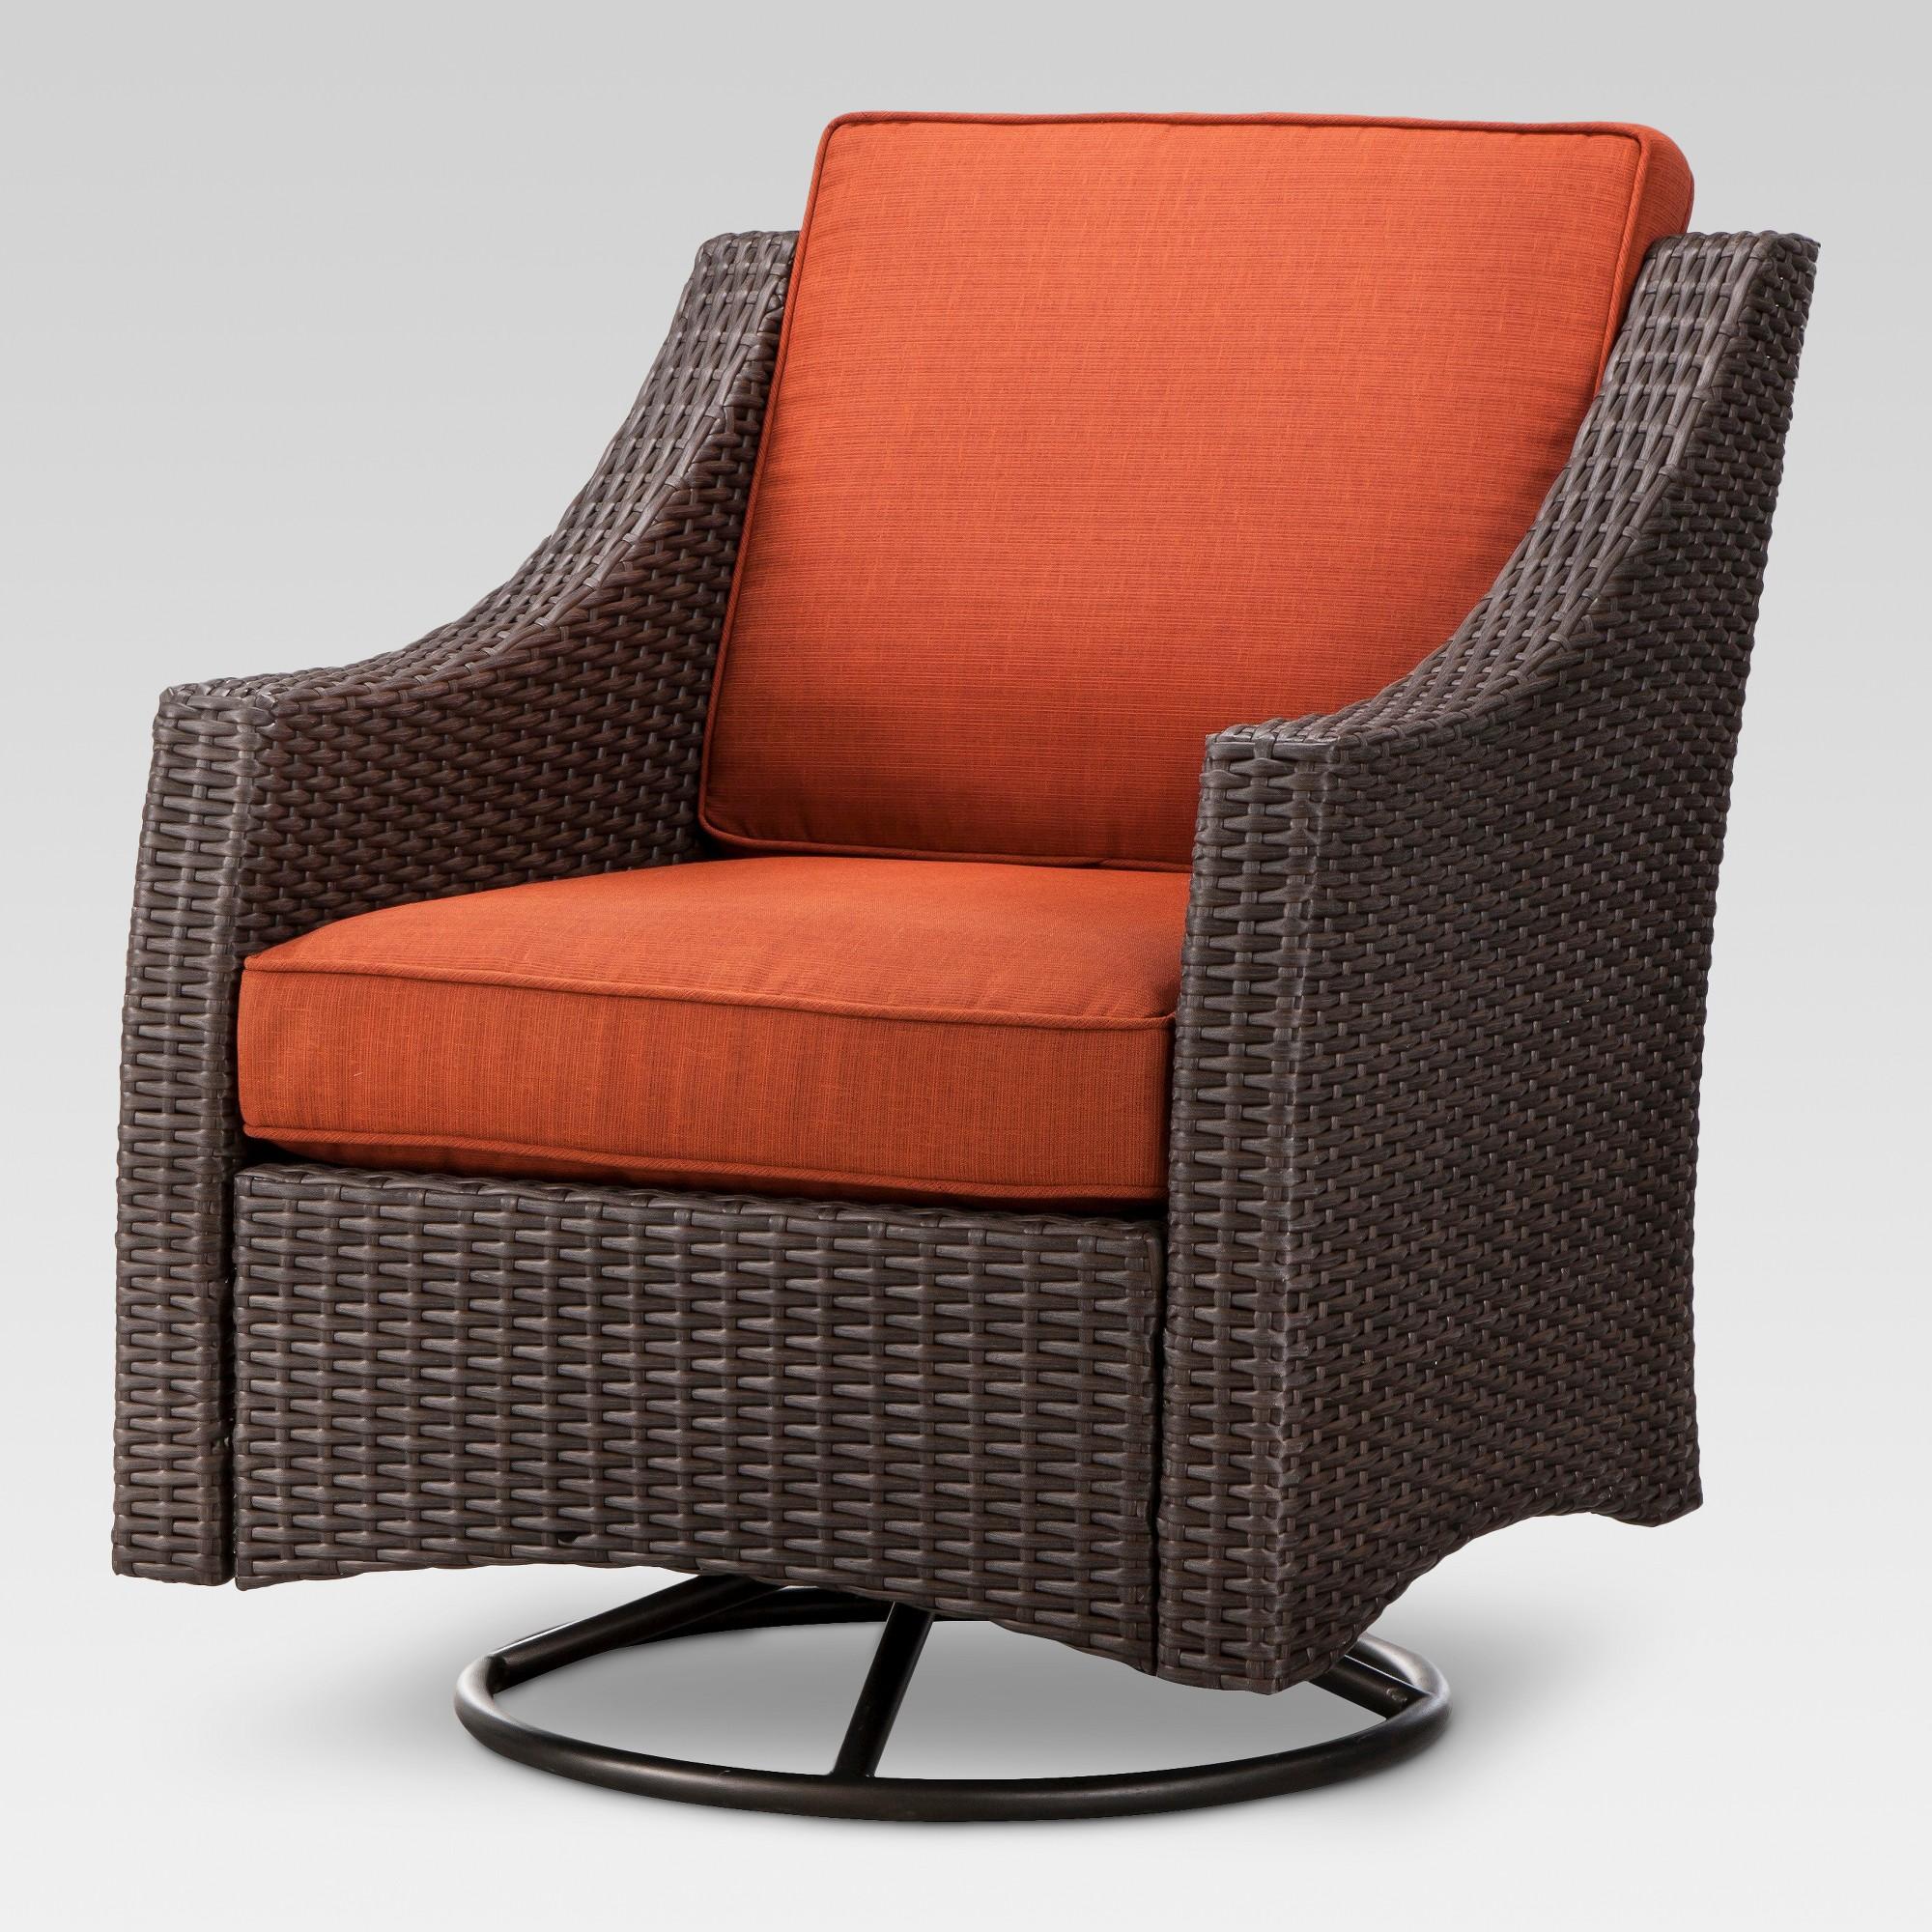 patio swivel rocker chairs retro dining gumtree brisbane belvedere wicker club chair orange threshold